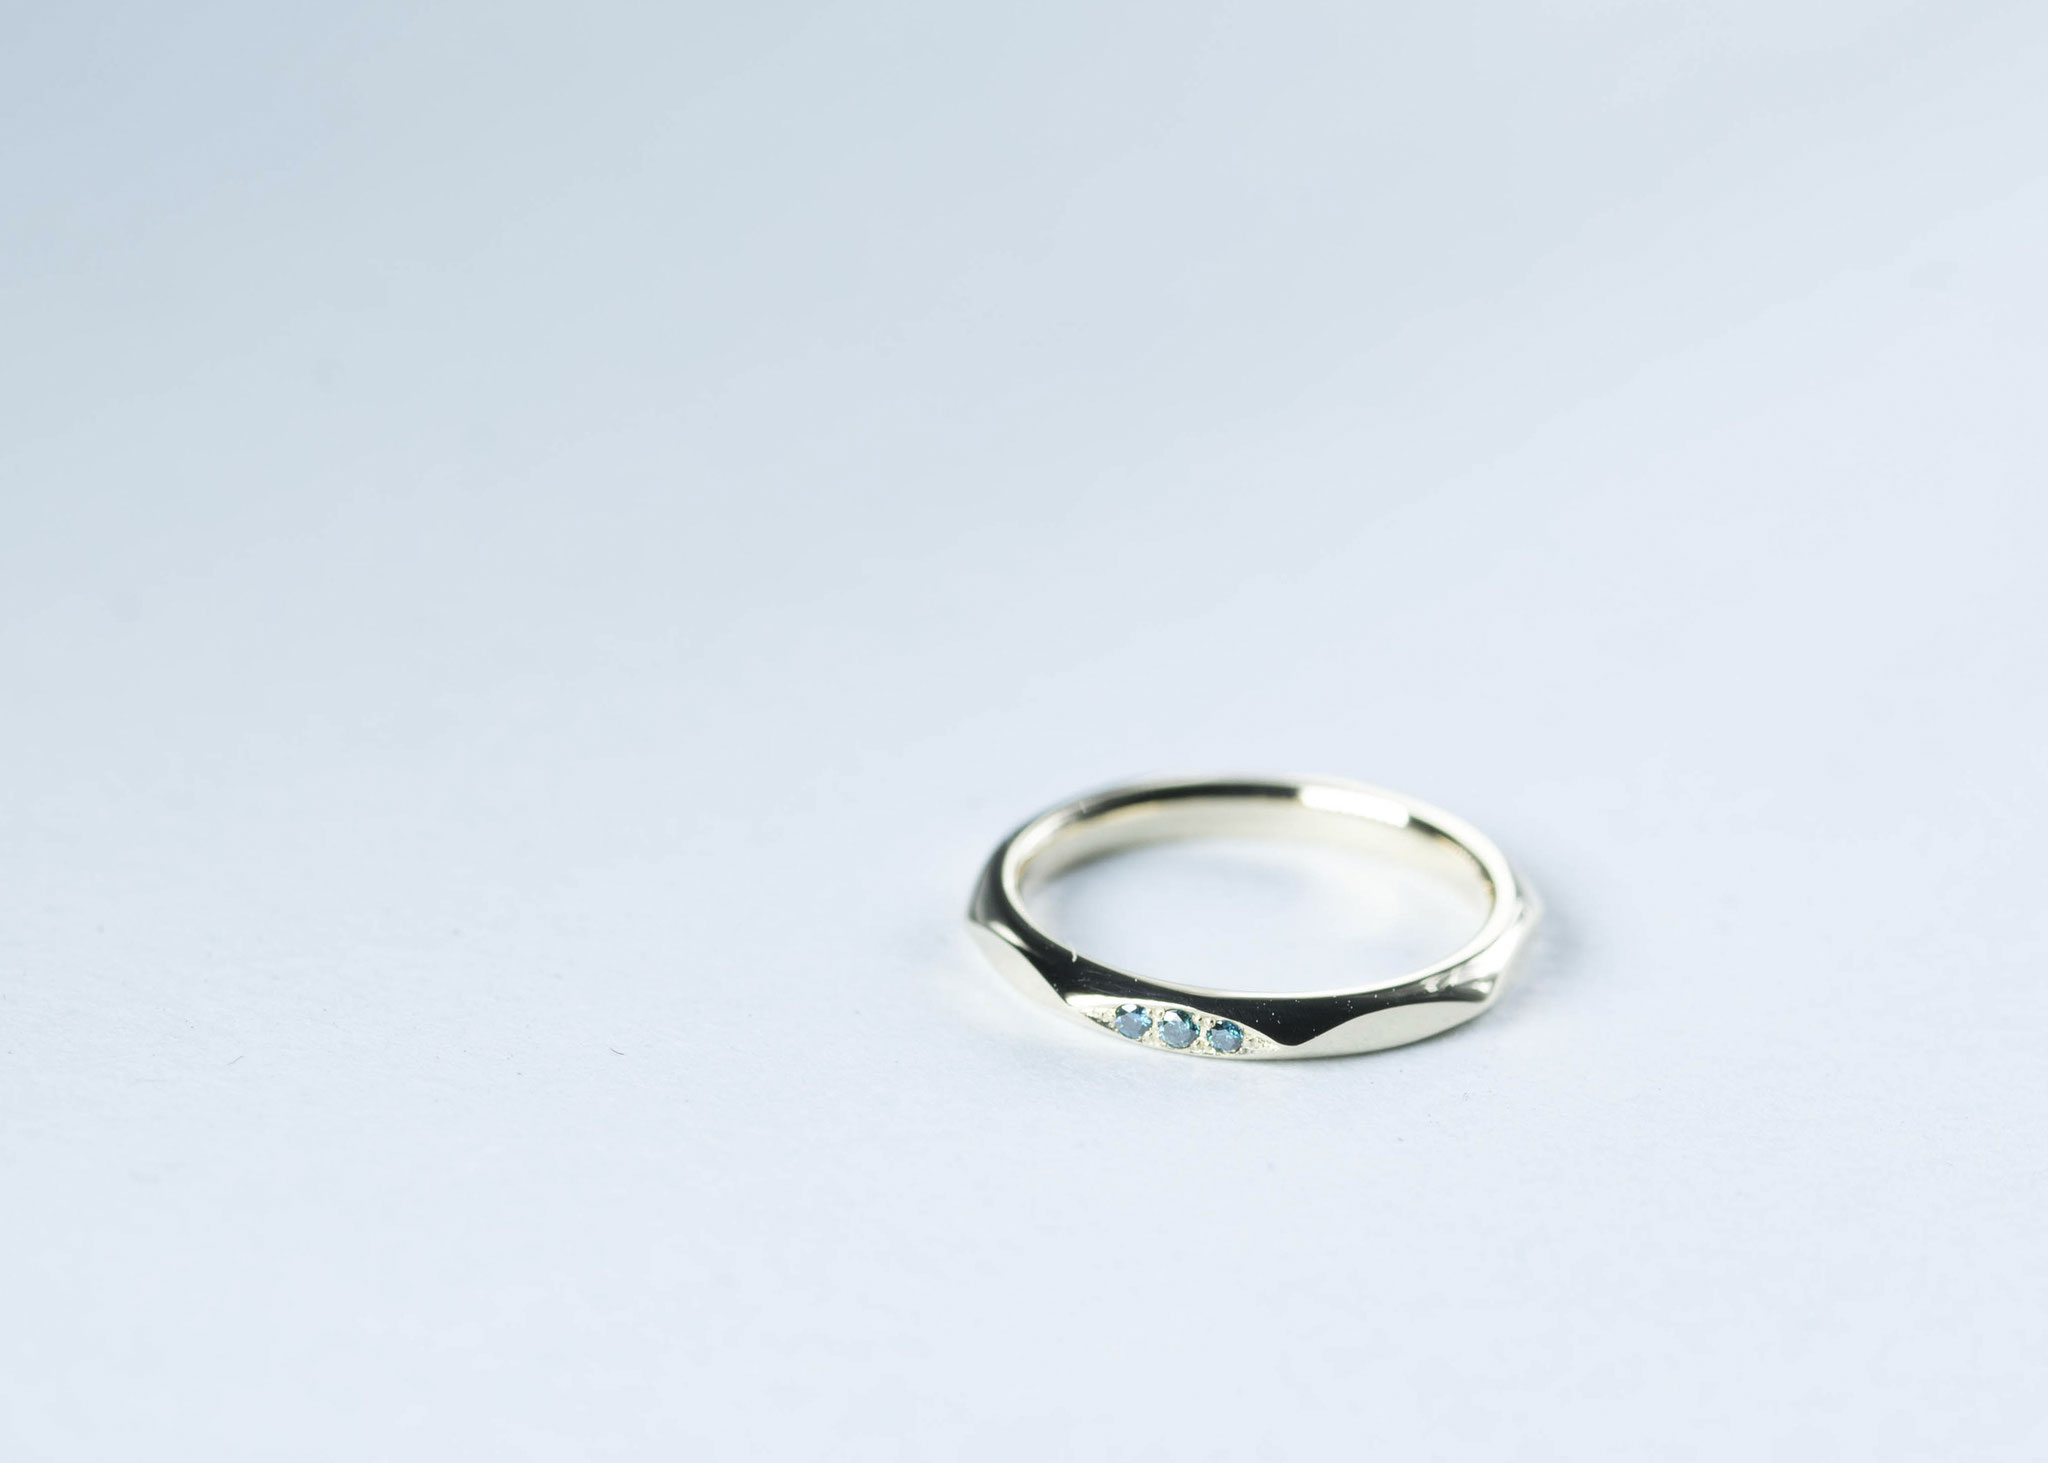 Bonheur Huit ダイヤモンド→ブルートリートメントダイヤモンドへ変更